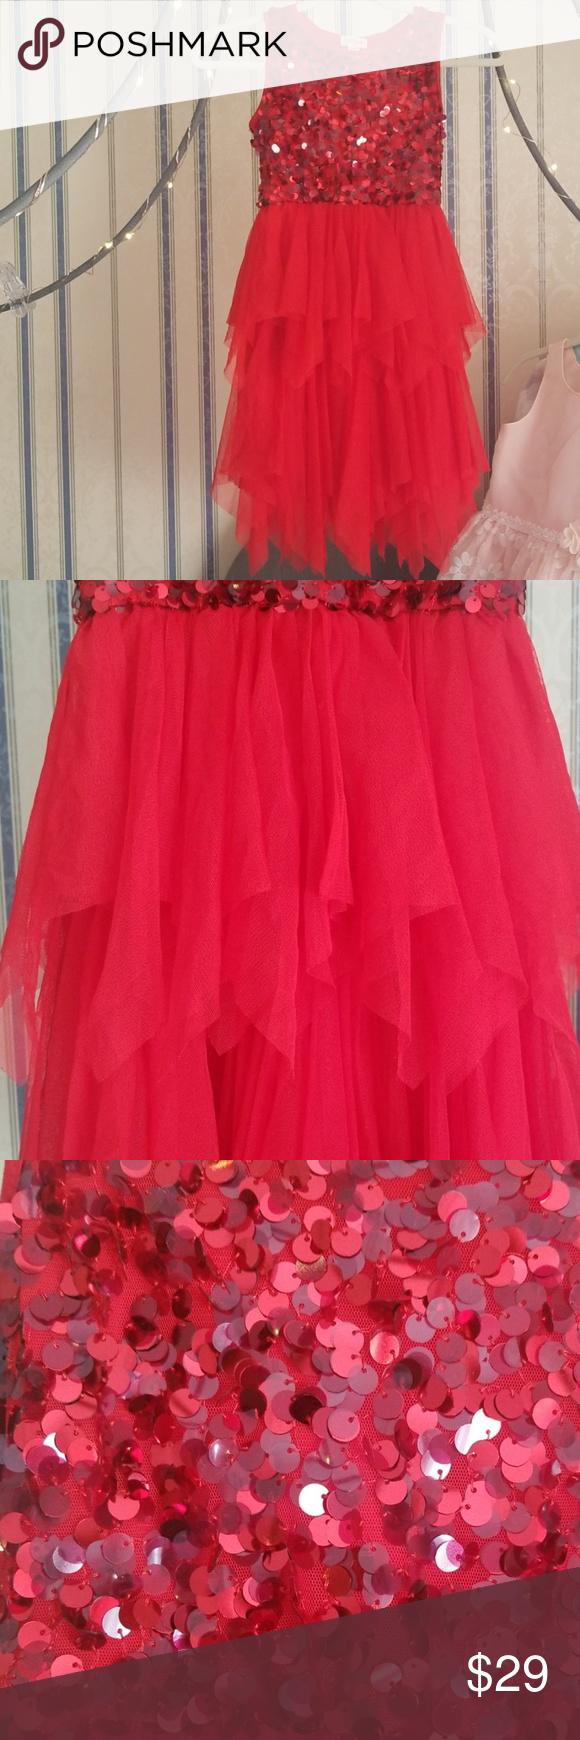 f4028fd0c Cat & Jack Girls Red Tulle Layered Sequin Dress Cat & Jack Girls M ...